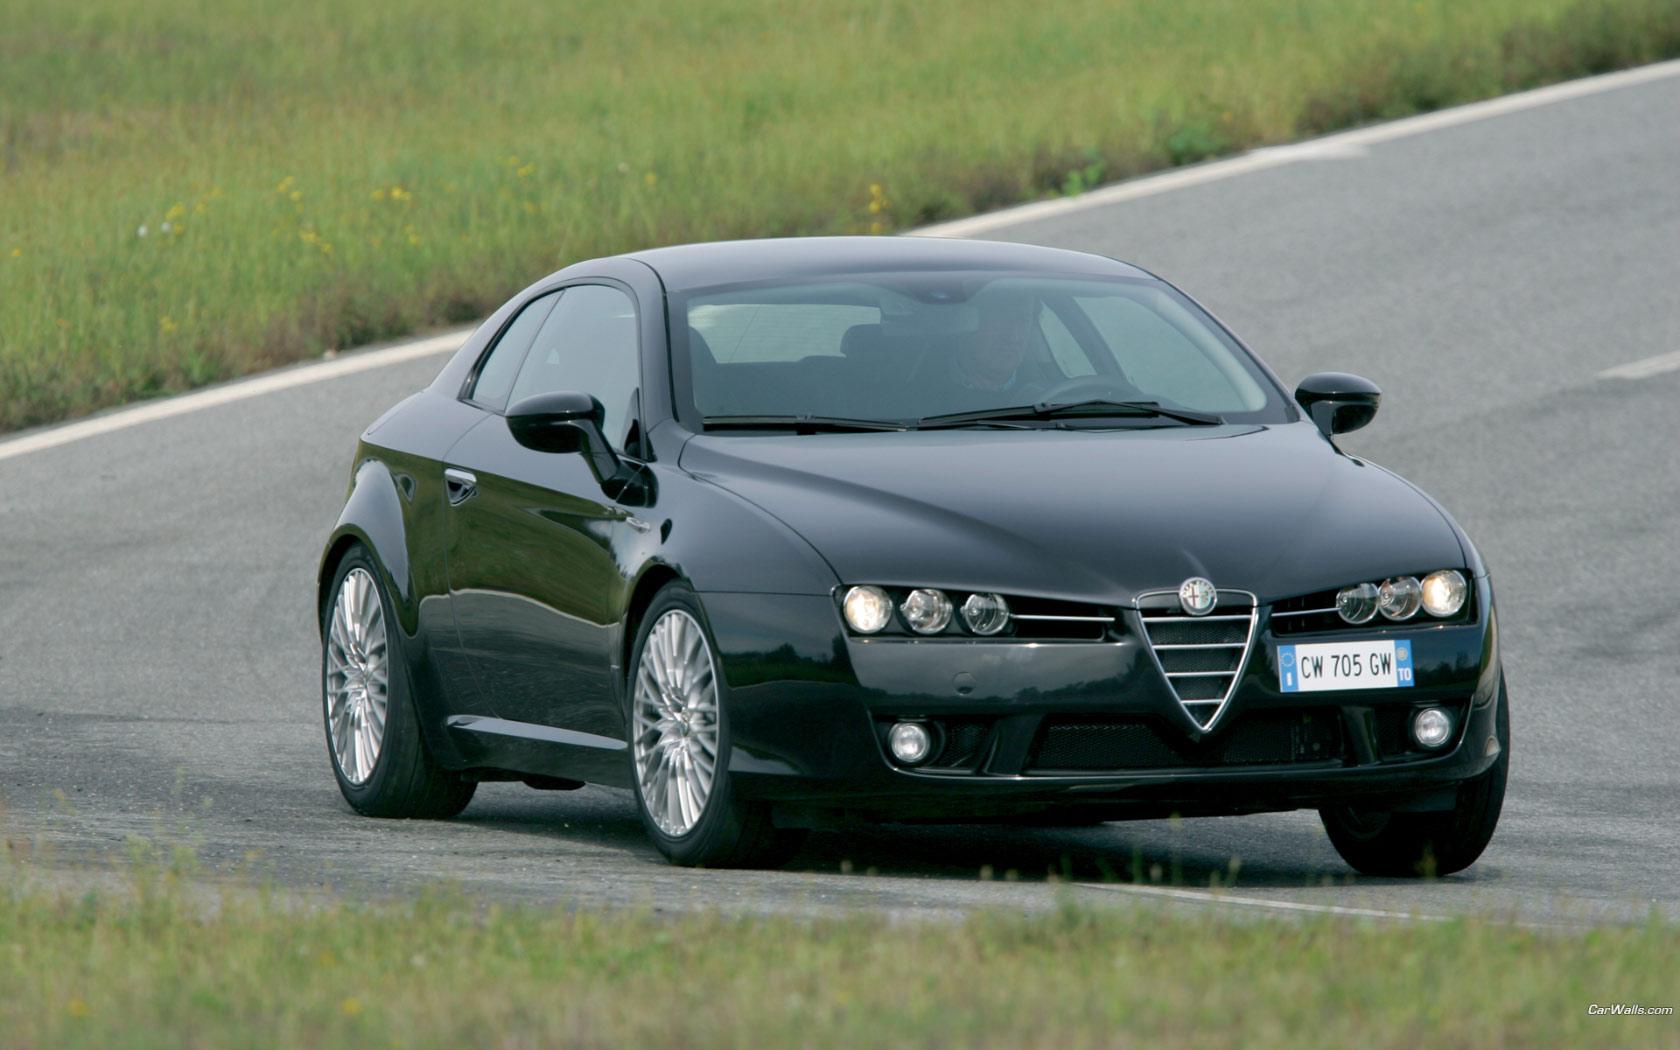 Alfa Romeo Brera 1680x1050 b111 - Tapety na pulpit - samochody sportowe, luksusowe, supersamochody